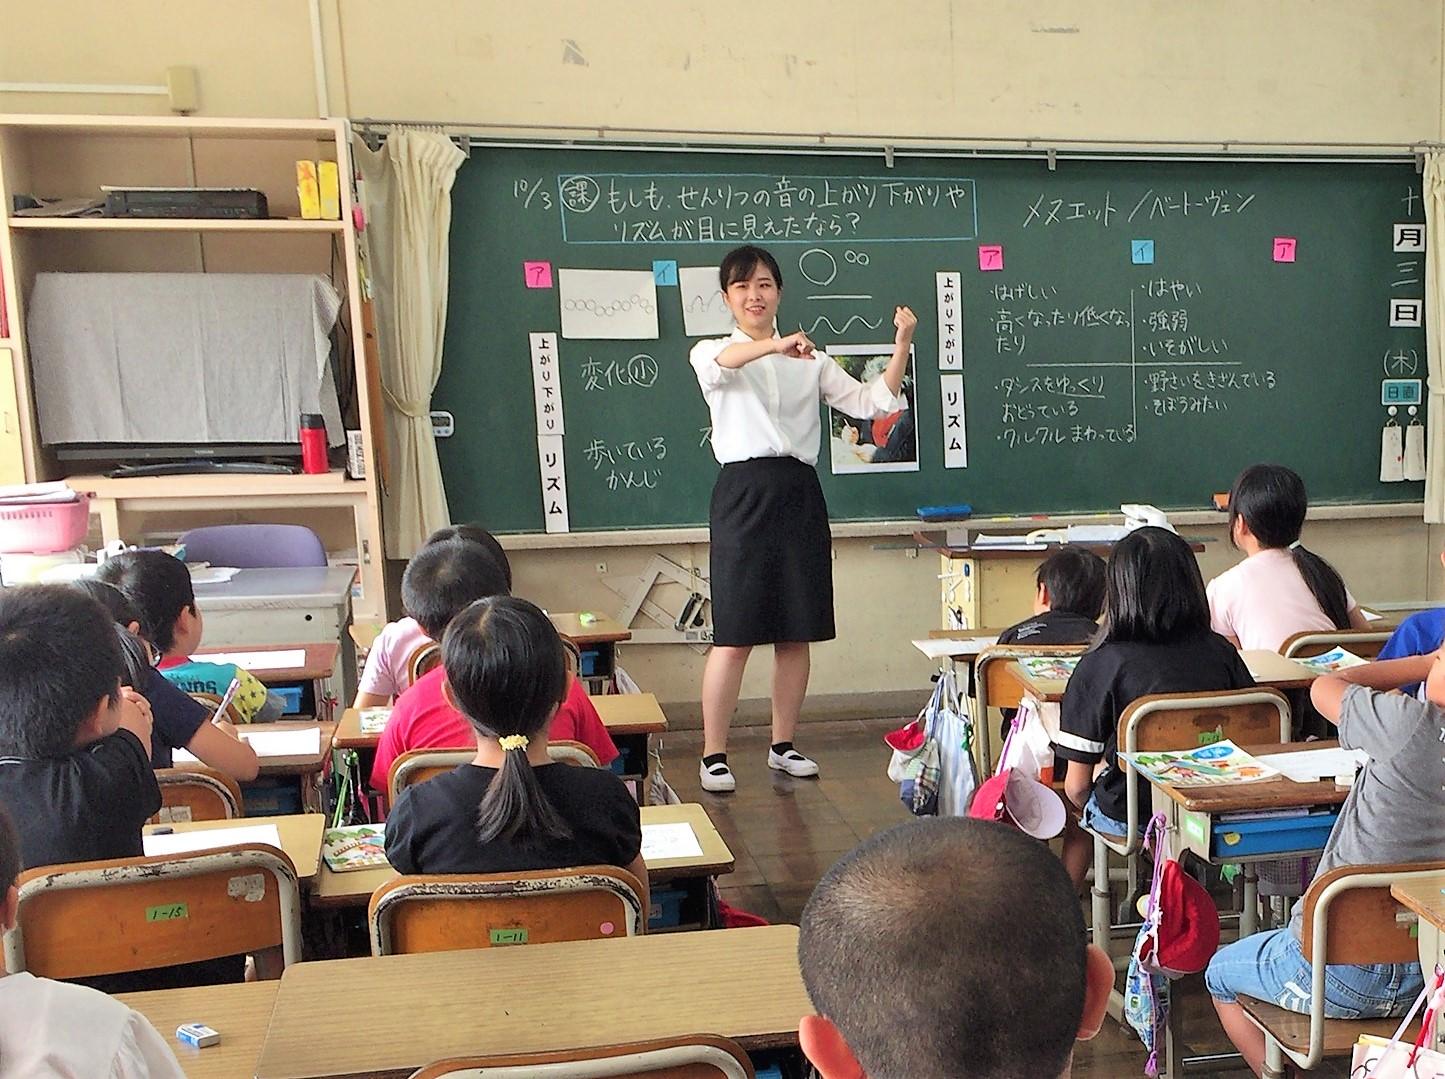 小学校の教育実習、4年生が奮闘中